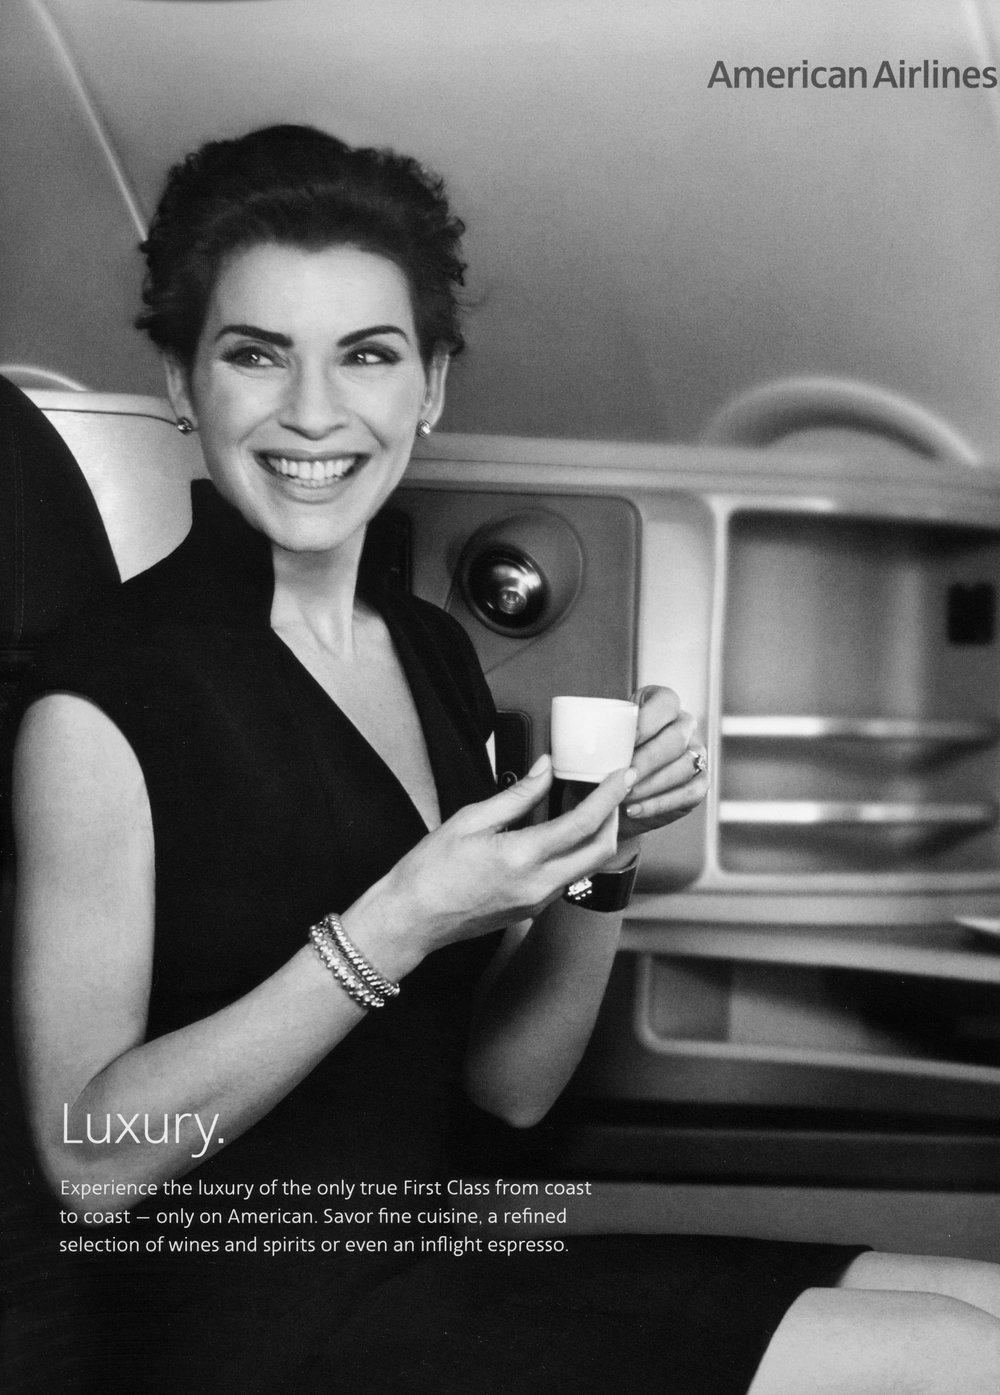 FA_Julianna Margulies-American Airlines_3 (Scan).jpg